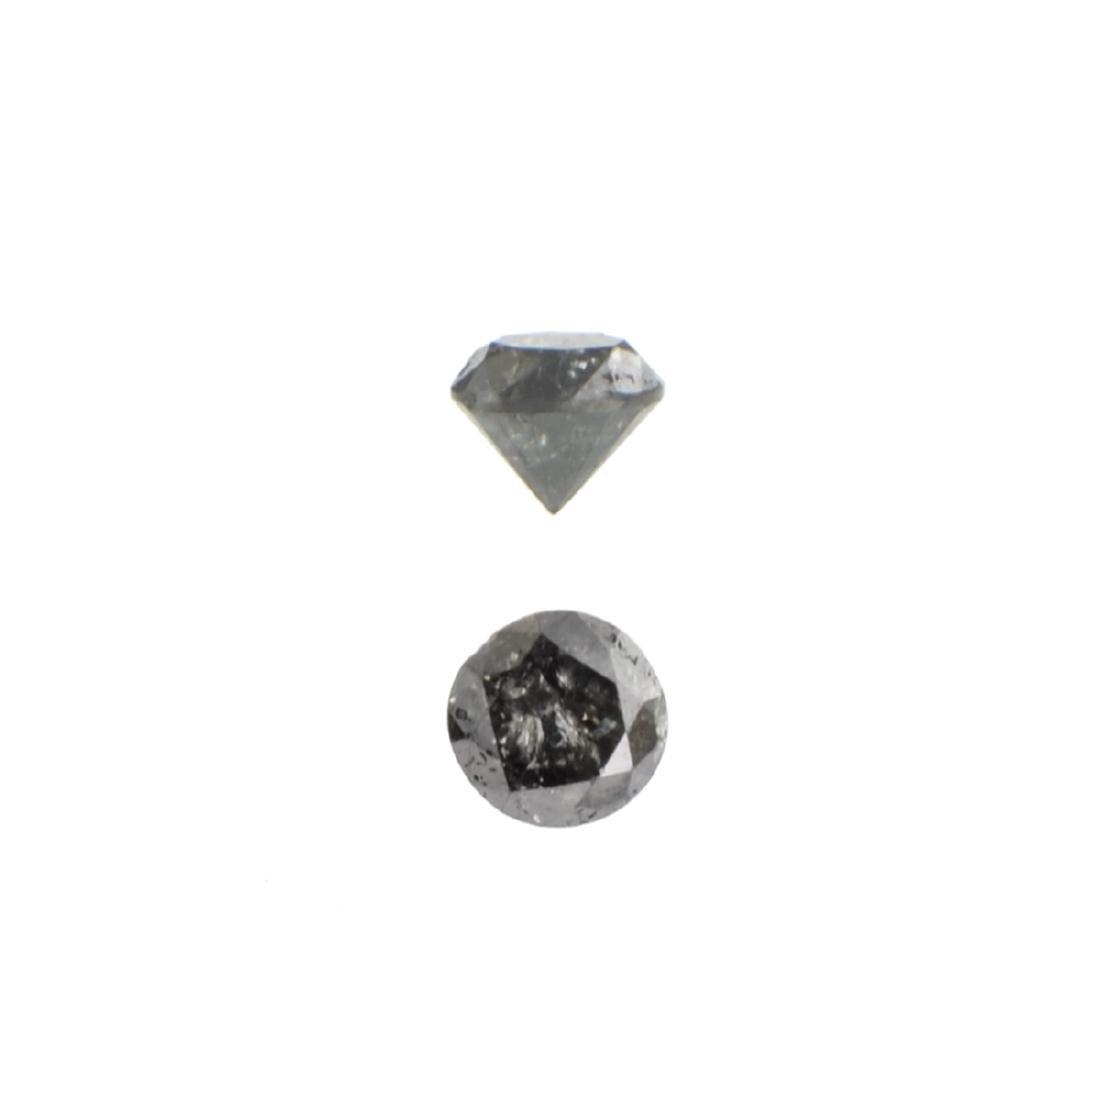 APP: 0.3k 0.34CT Round Cut Black Diamond Gemstone